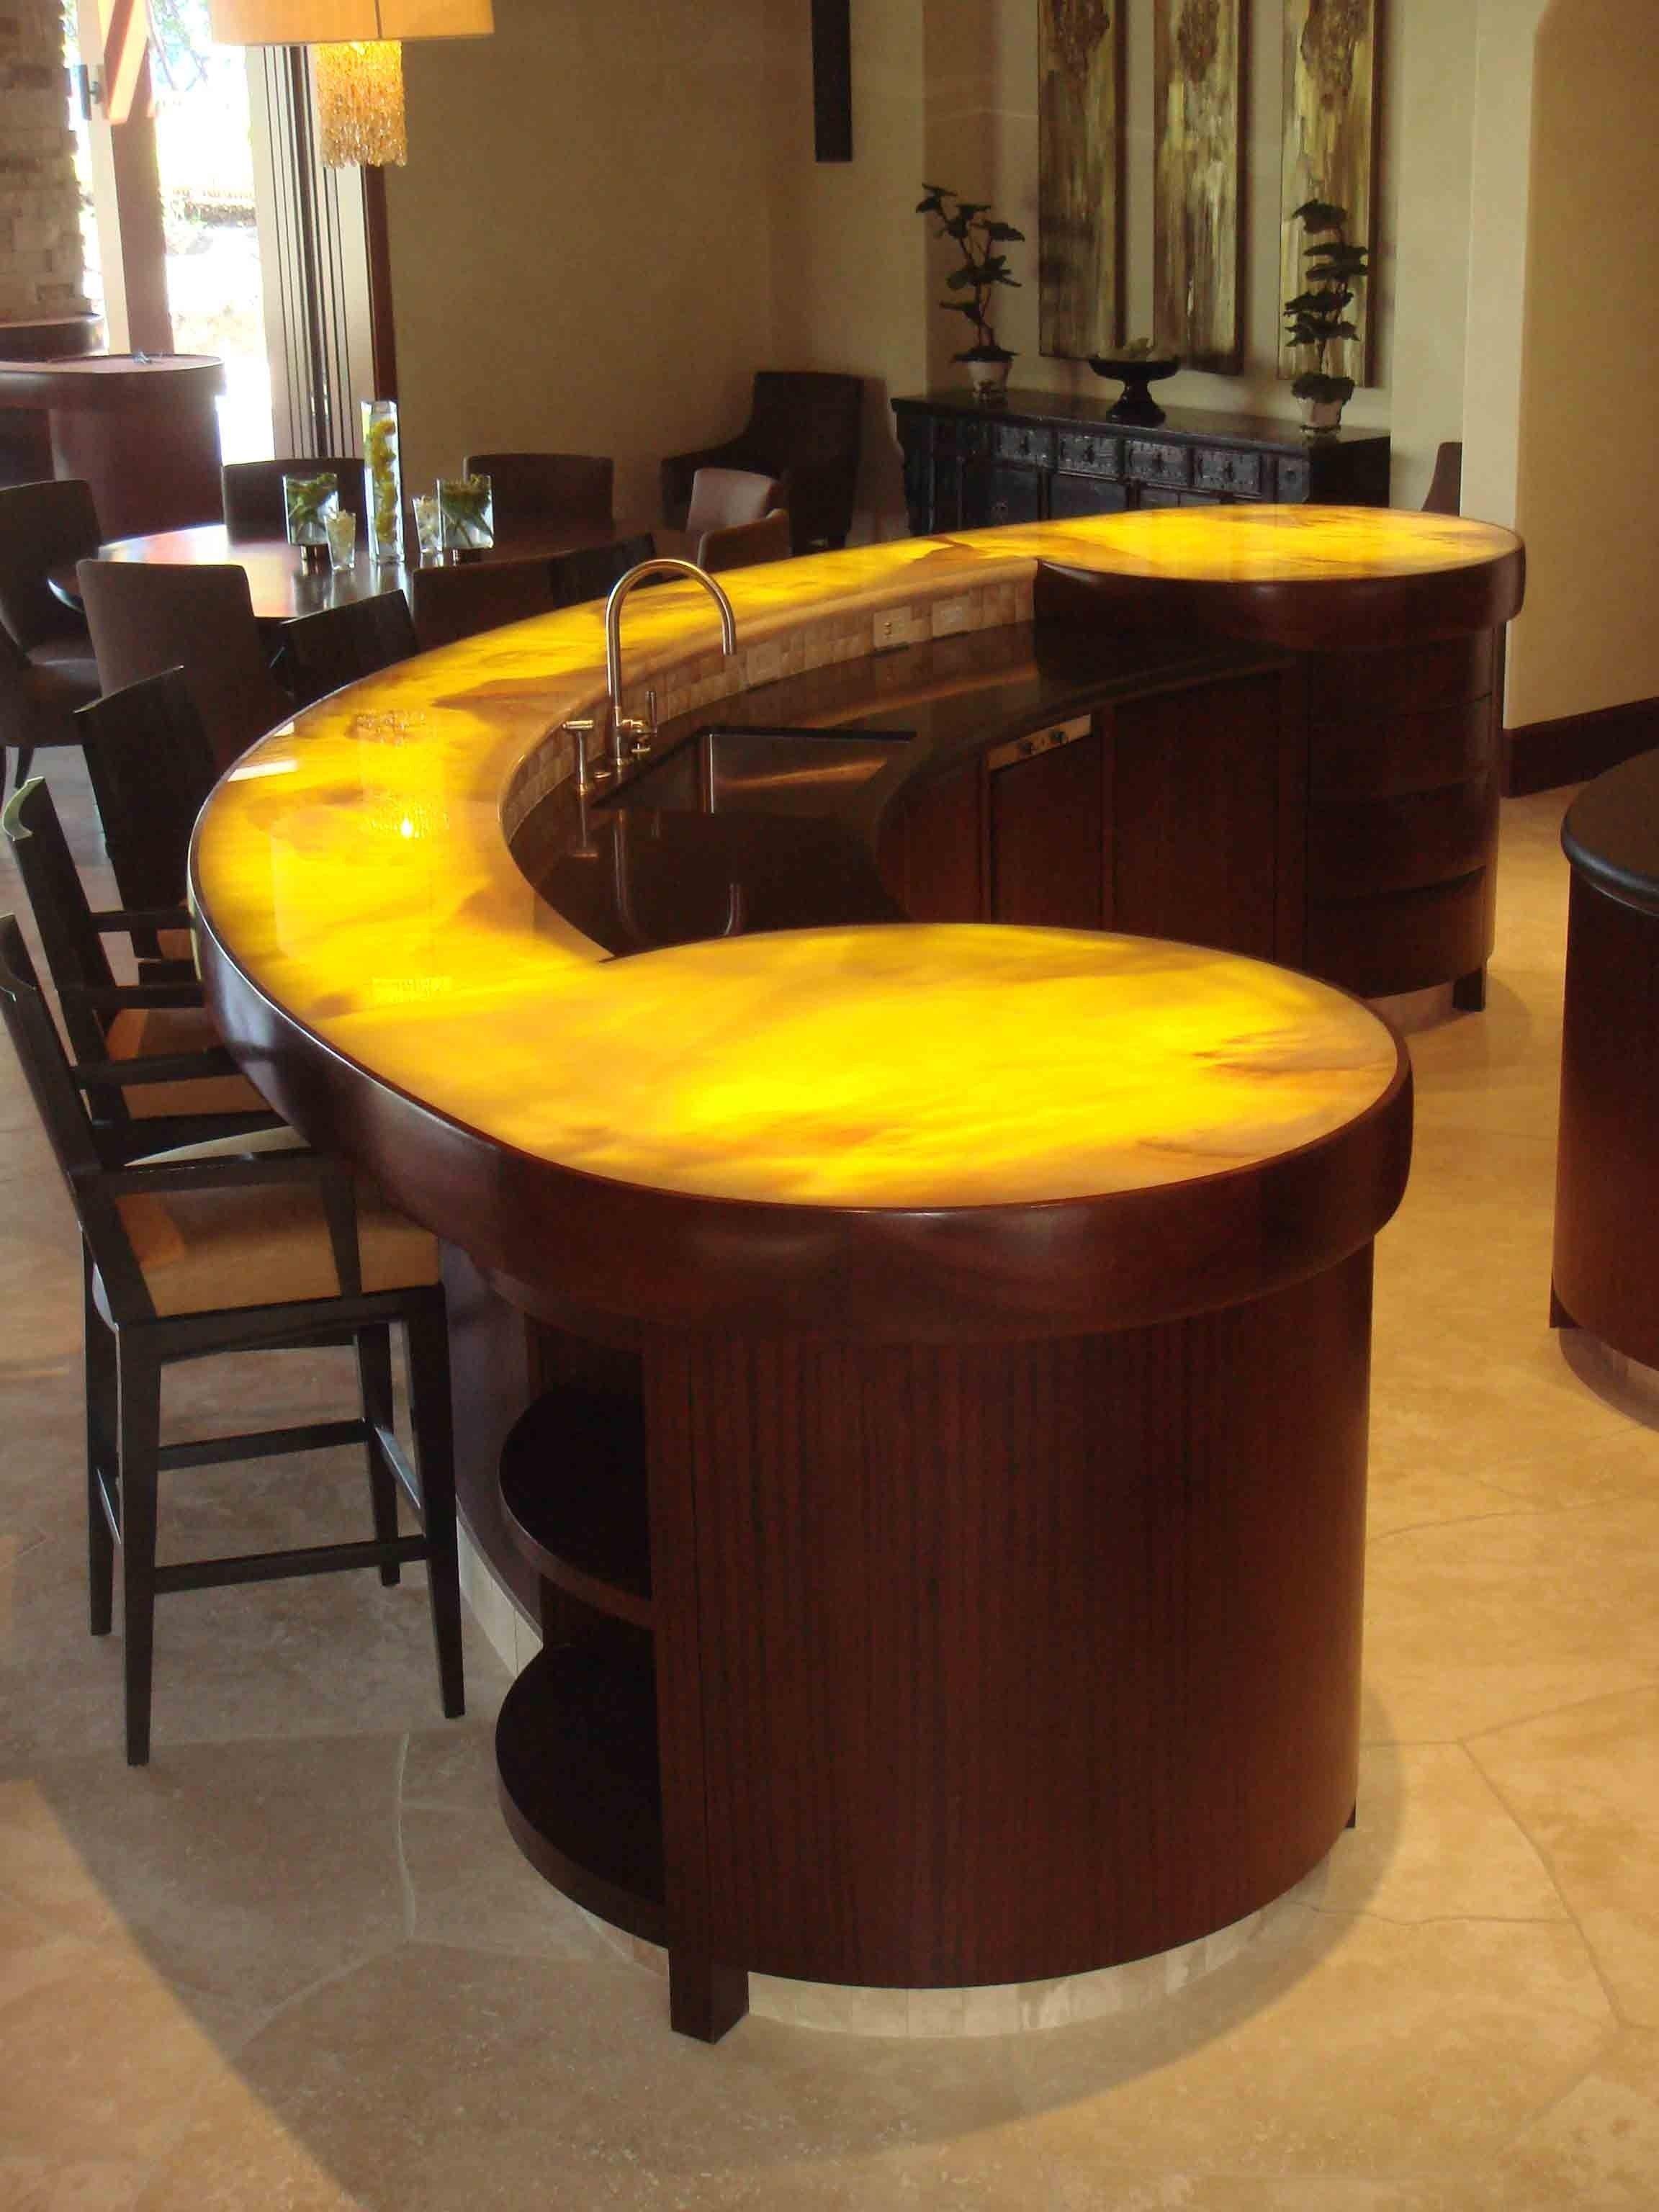 10 Unique Home Bar Ideas On A Budget refundable home bar ideas diy on a budget bentyl us wwkuswandoro 2020